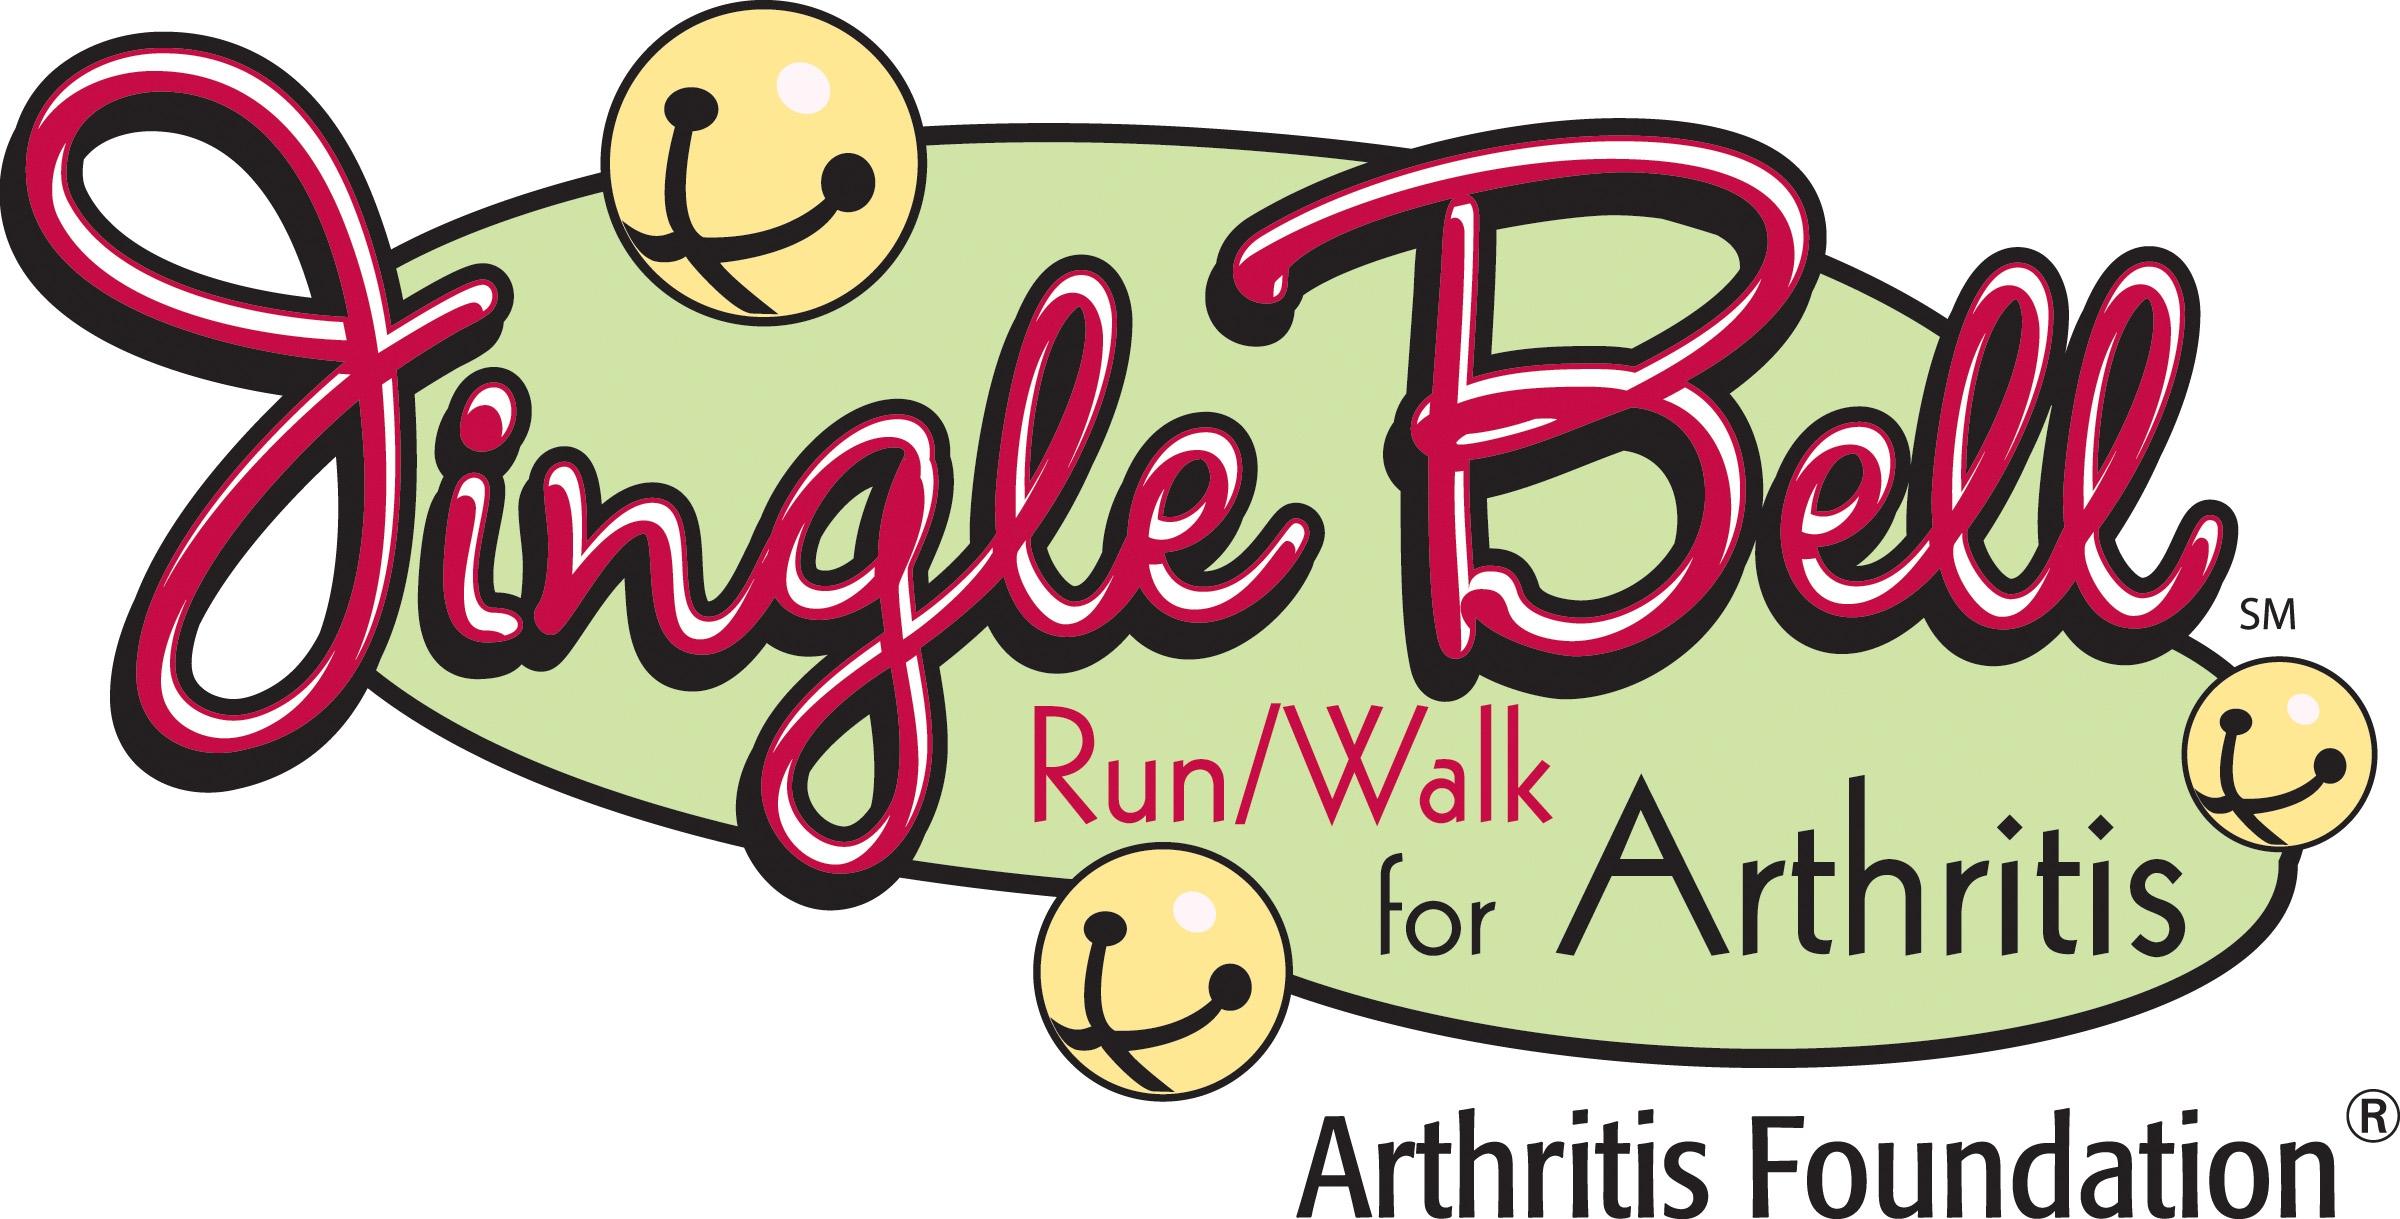 Jingle Bell Run/Walk for Juvenile Arthritis